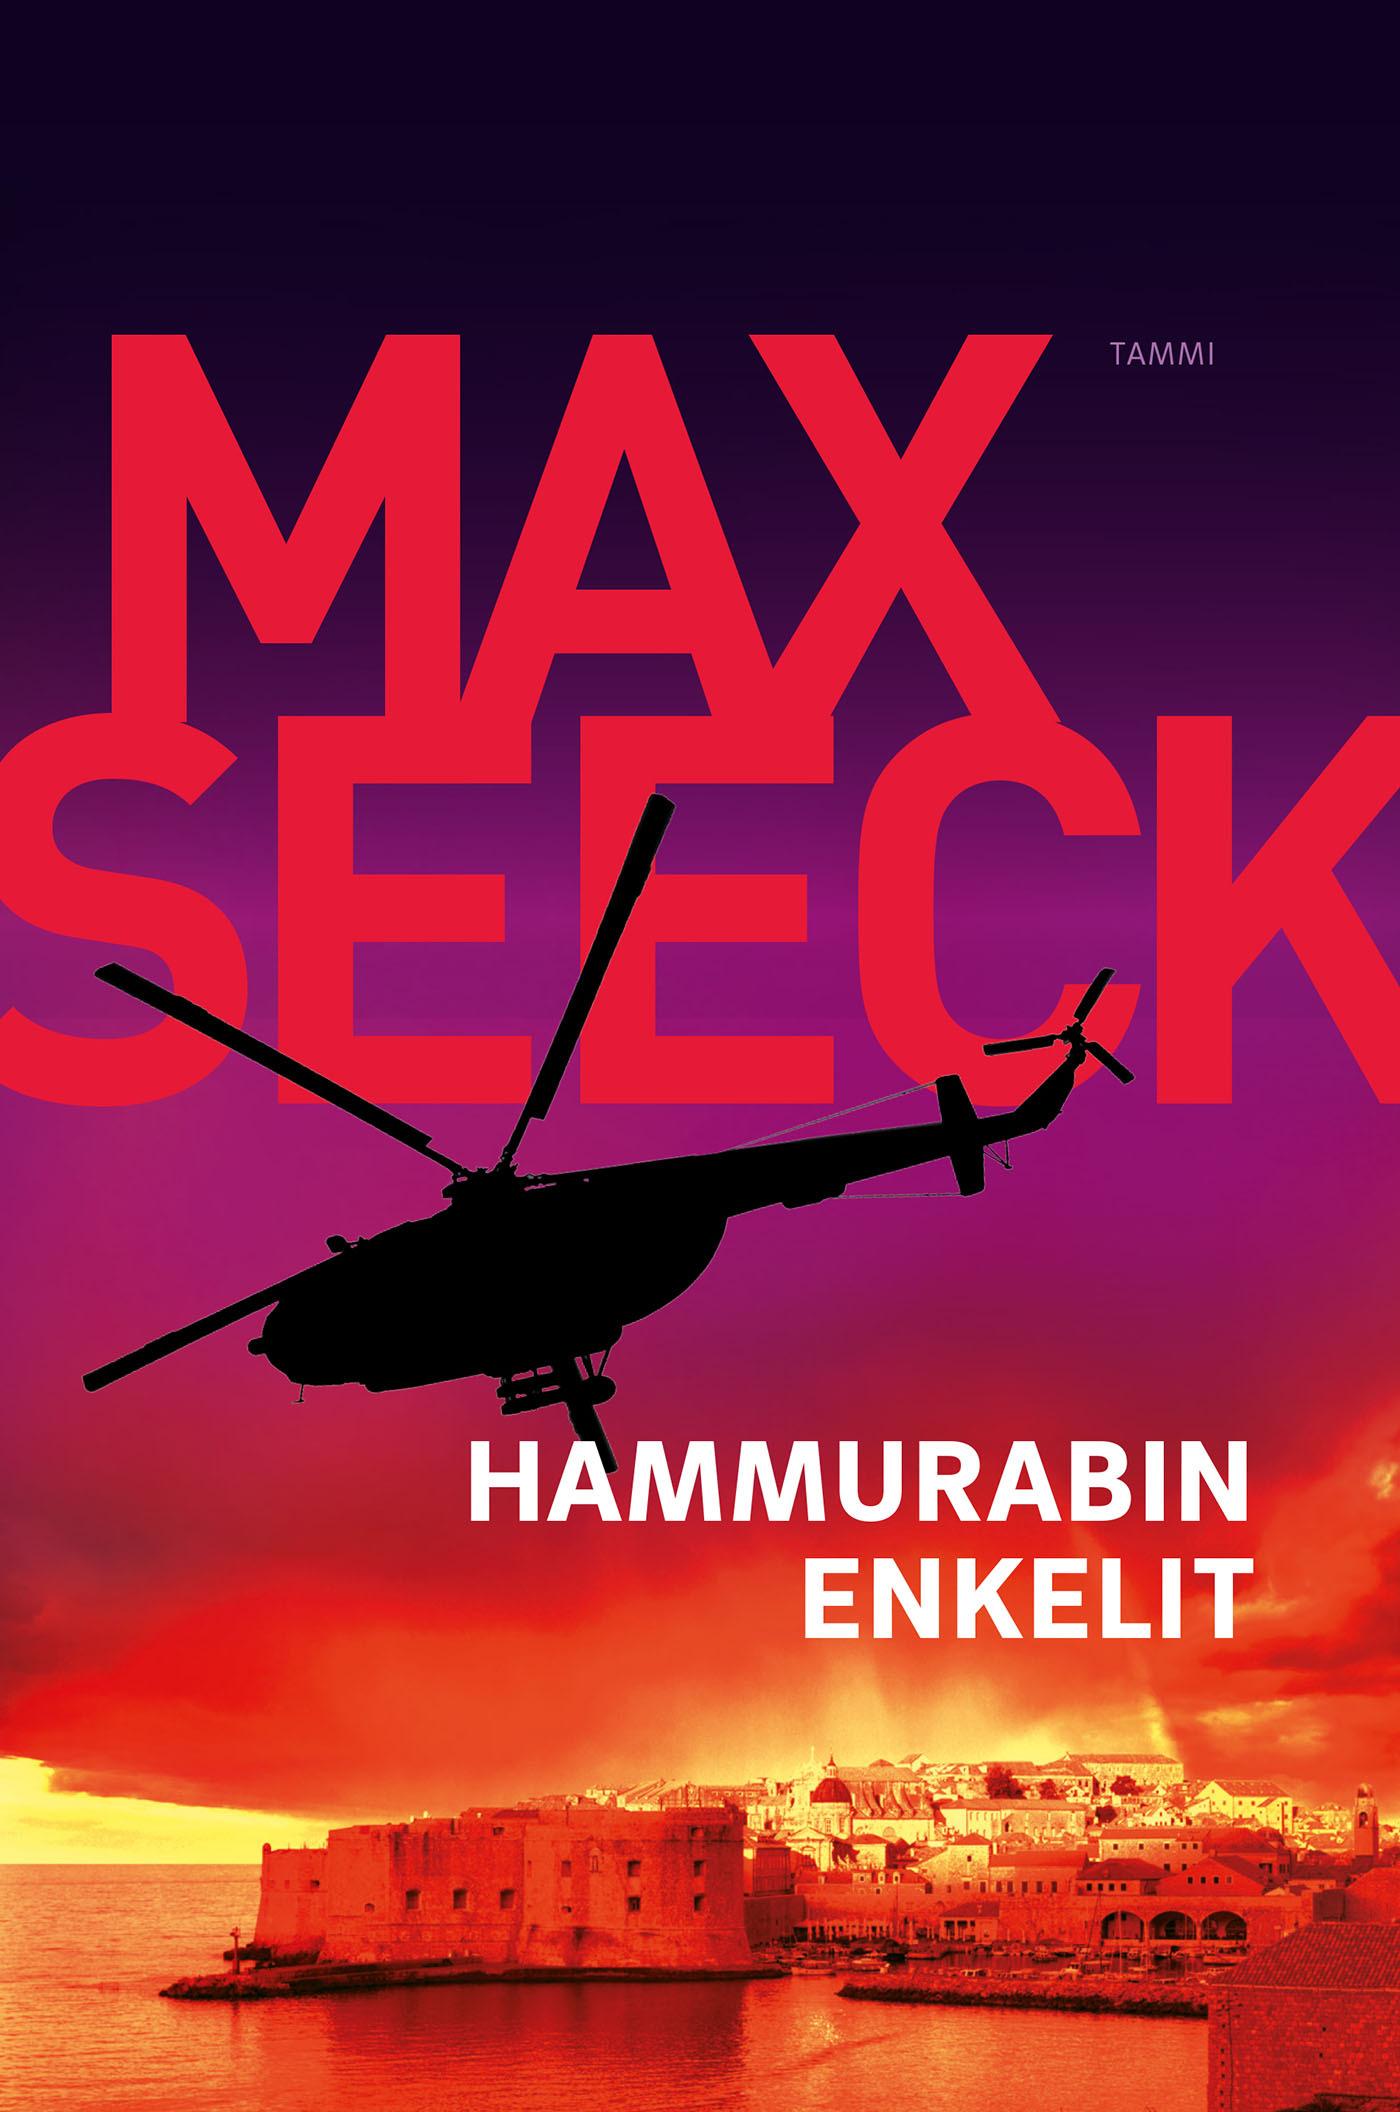 Seeck, Max - Hammurabin enkelit, e-kirja